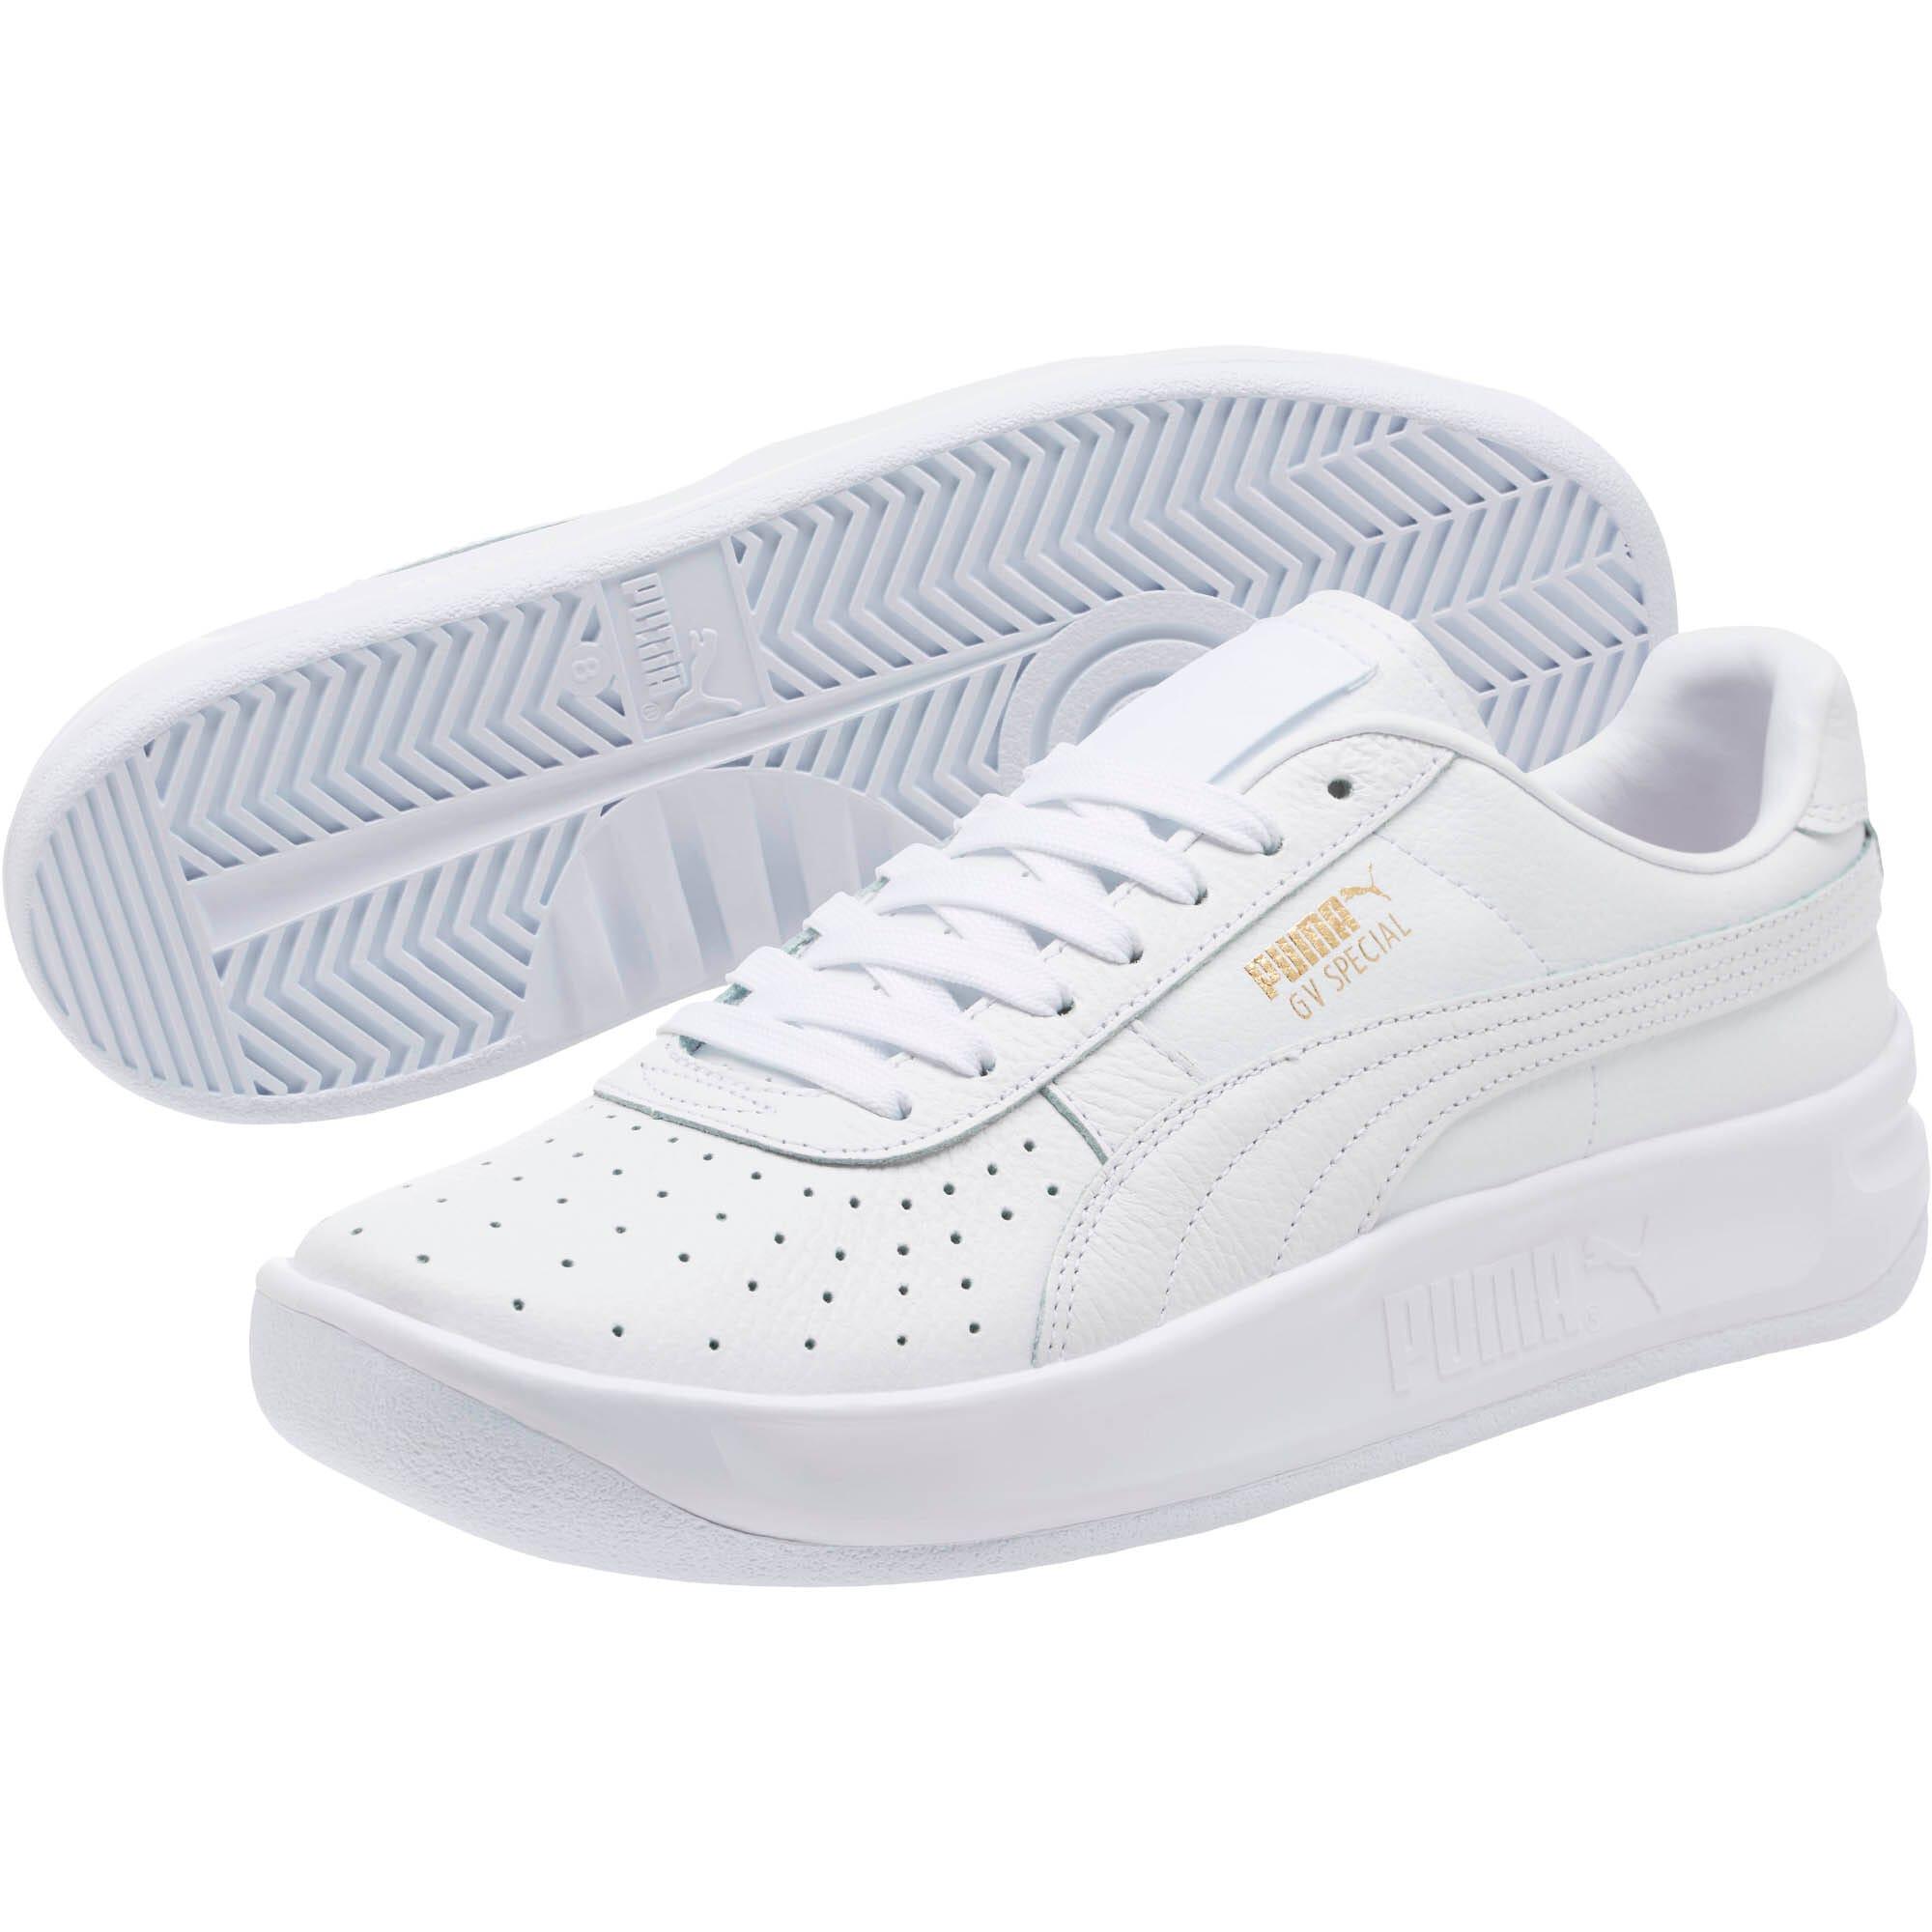 Thumbnail 2 of GV Special+ Sneakers, Puma White-Puma White, medium